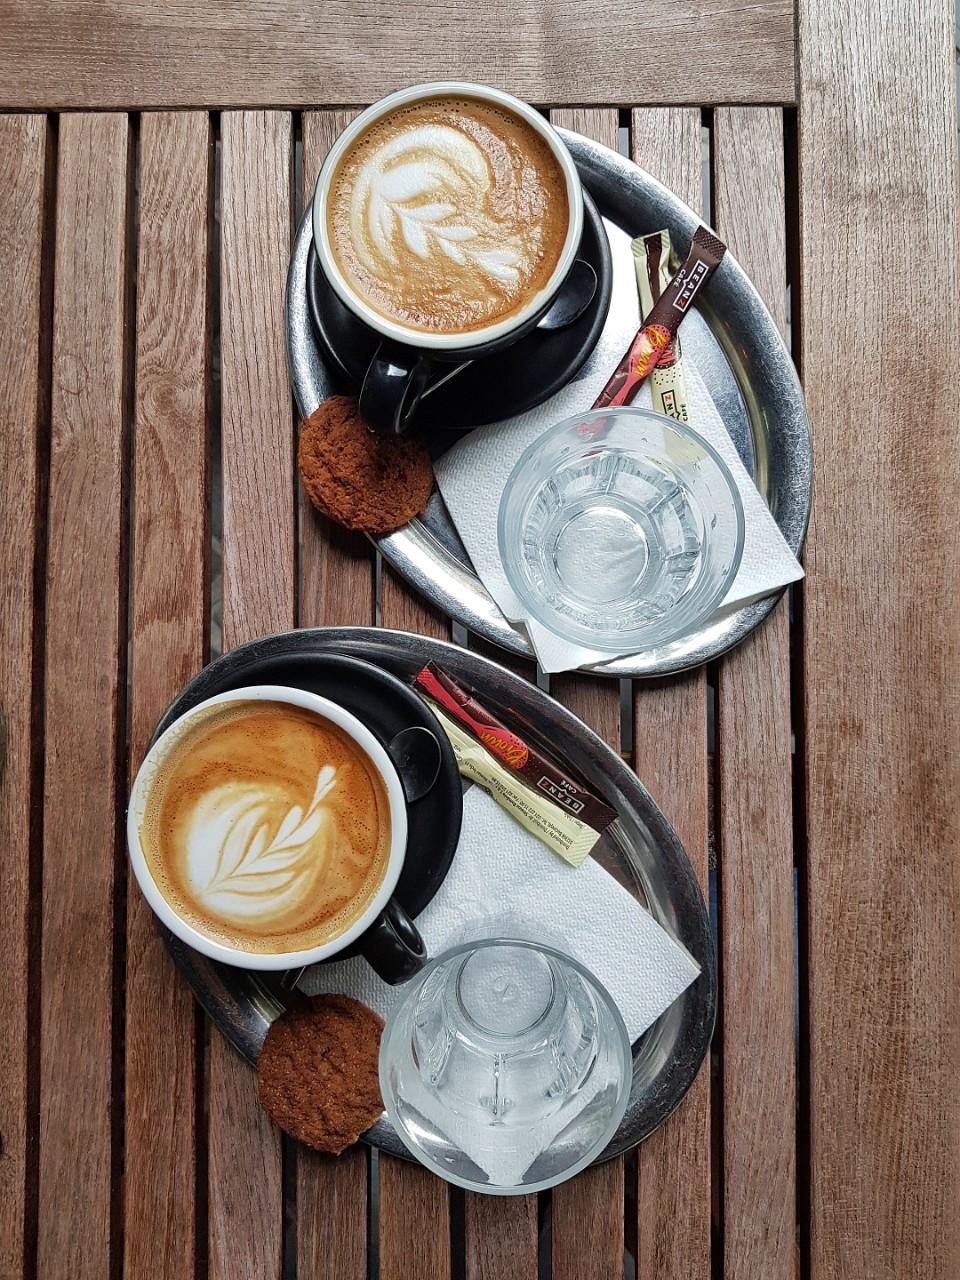 Tipografia coffee - Brasov